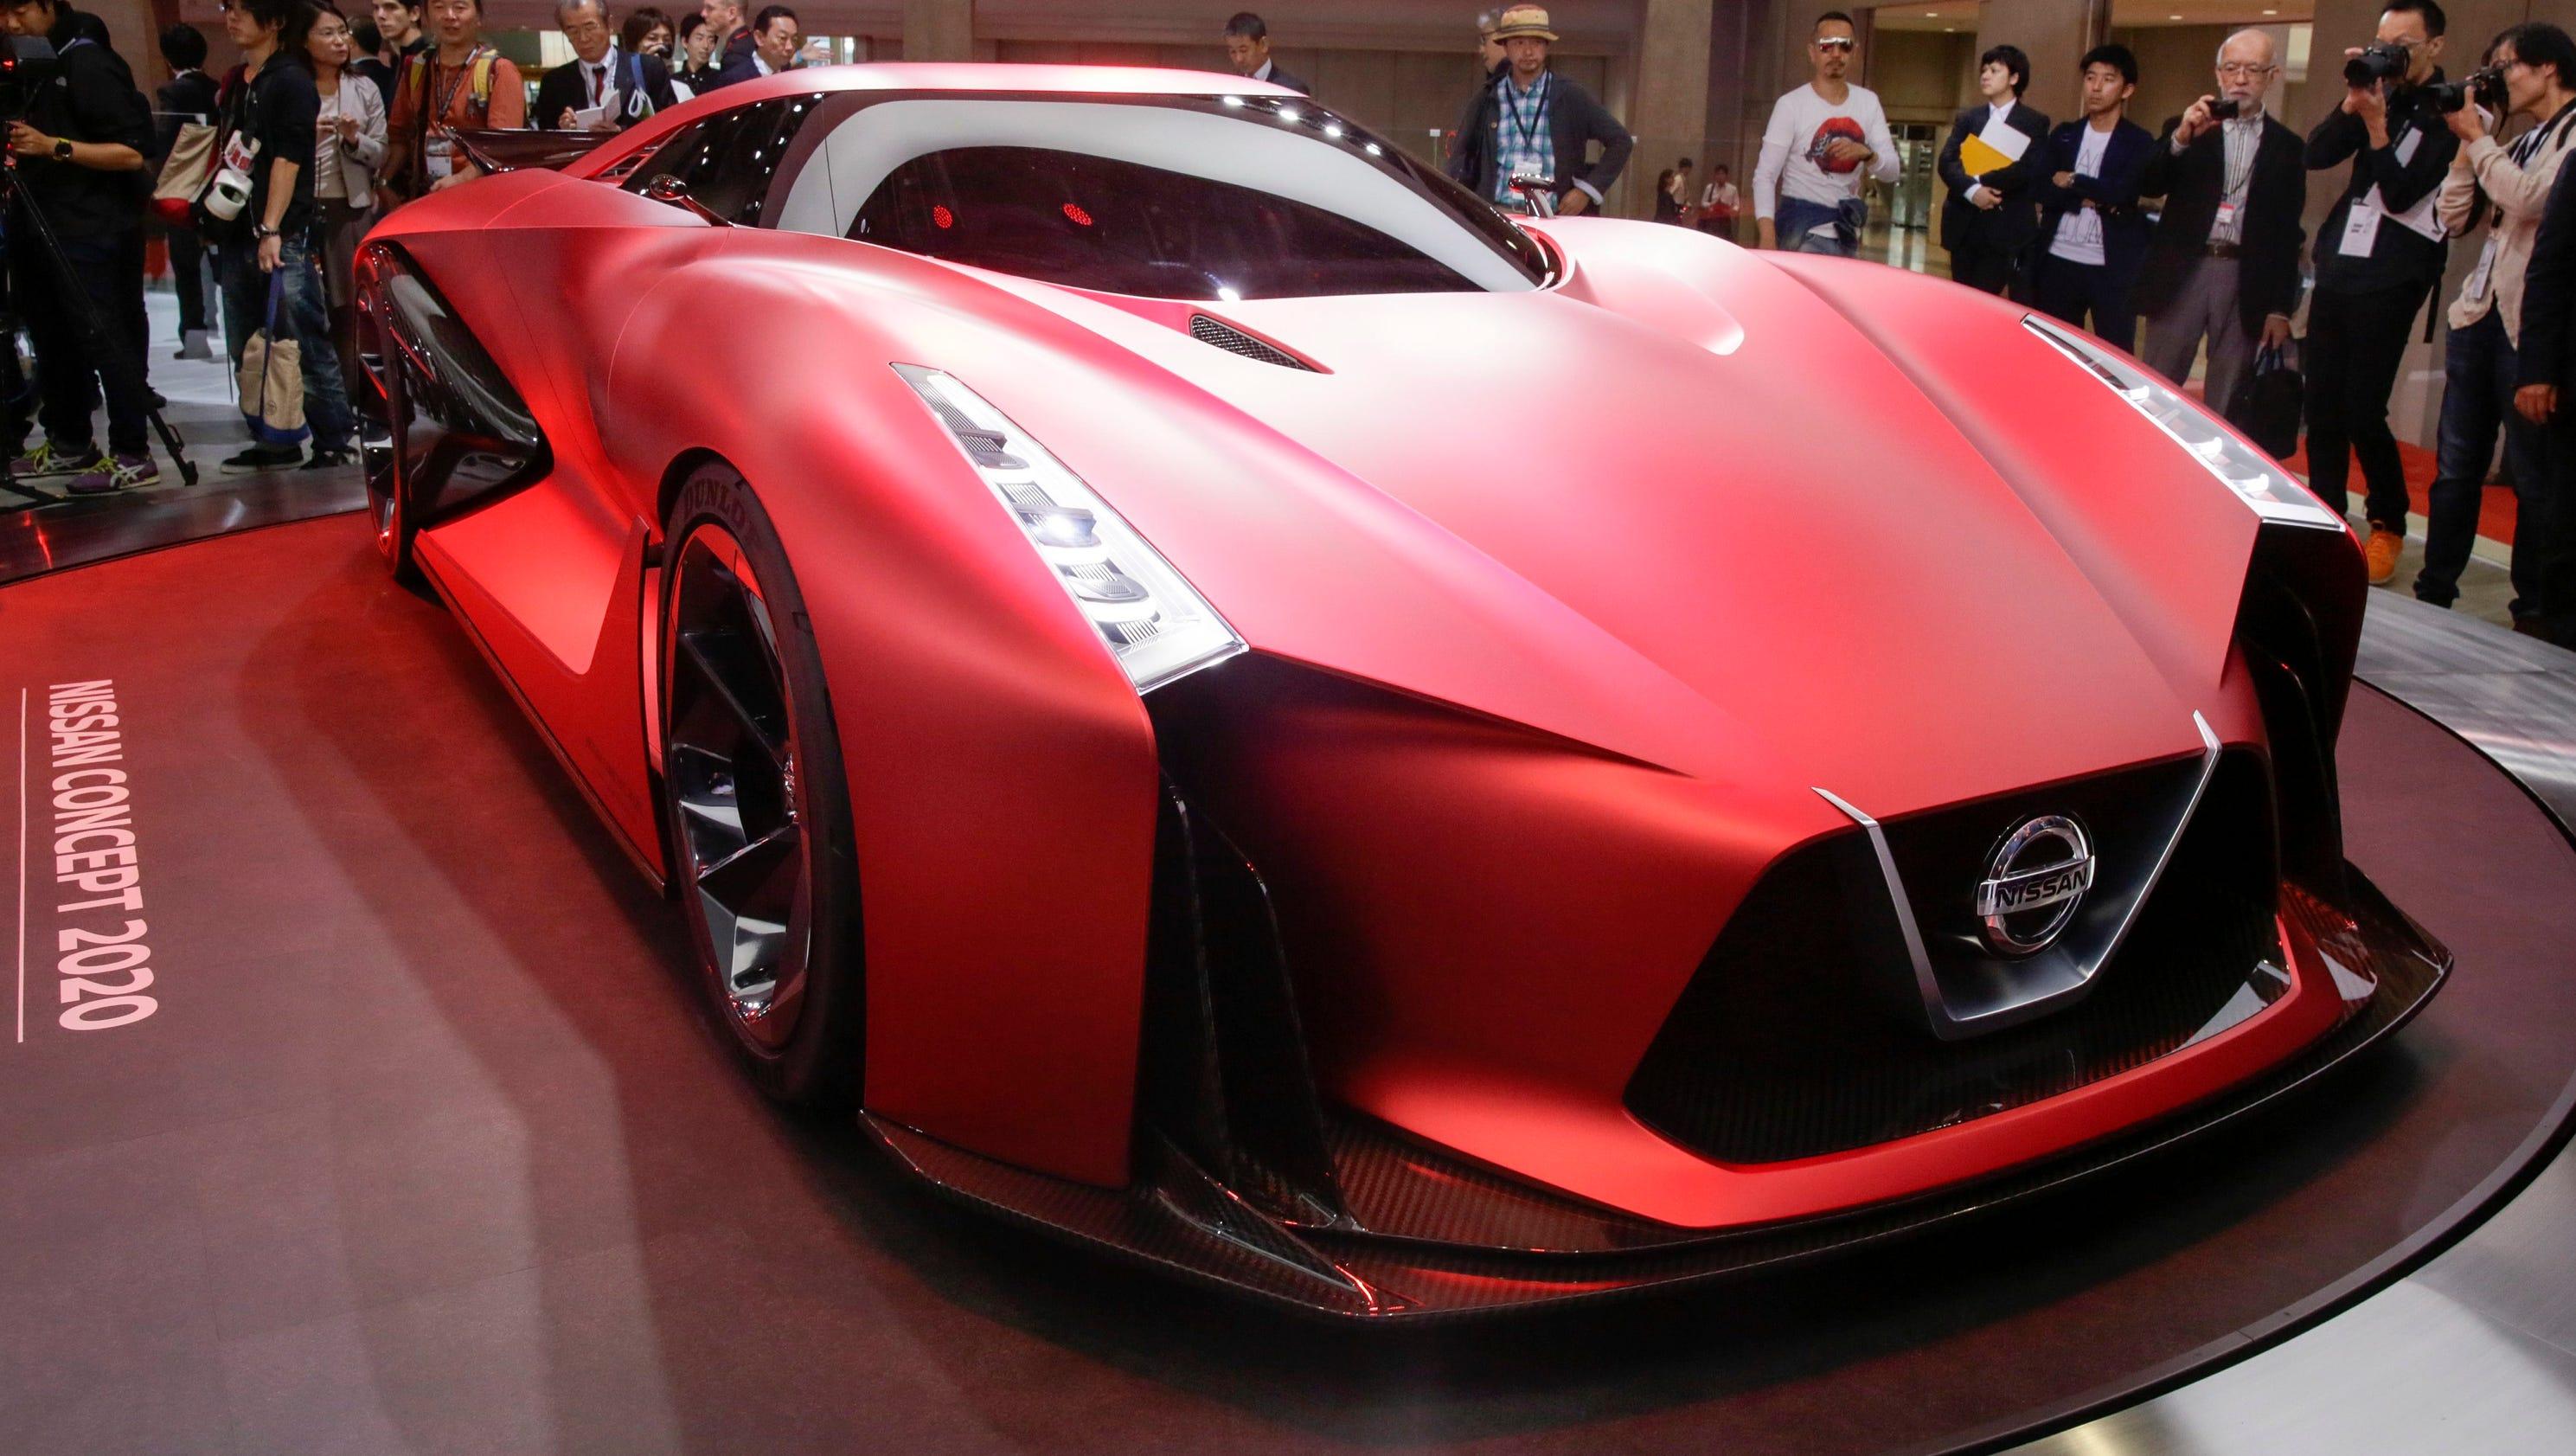 Wild car designs debut at tokyo motor show - Car design show ...